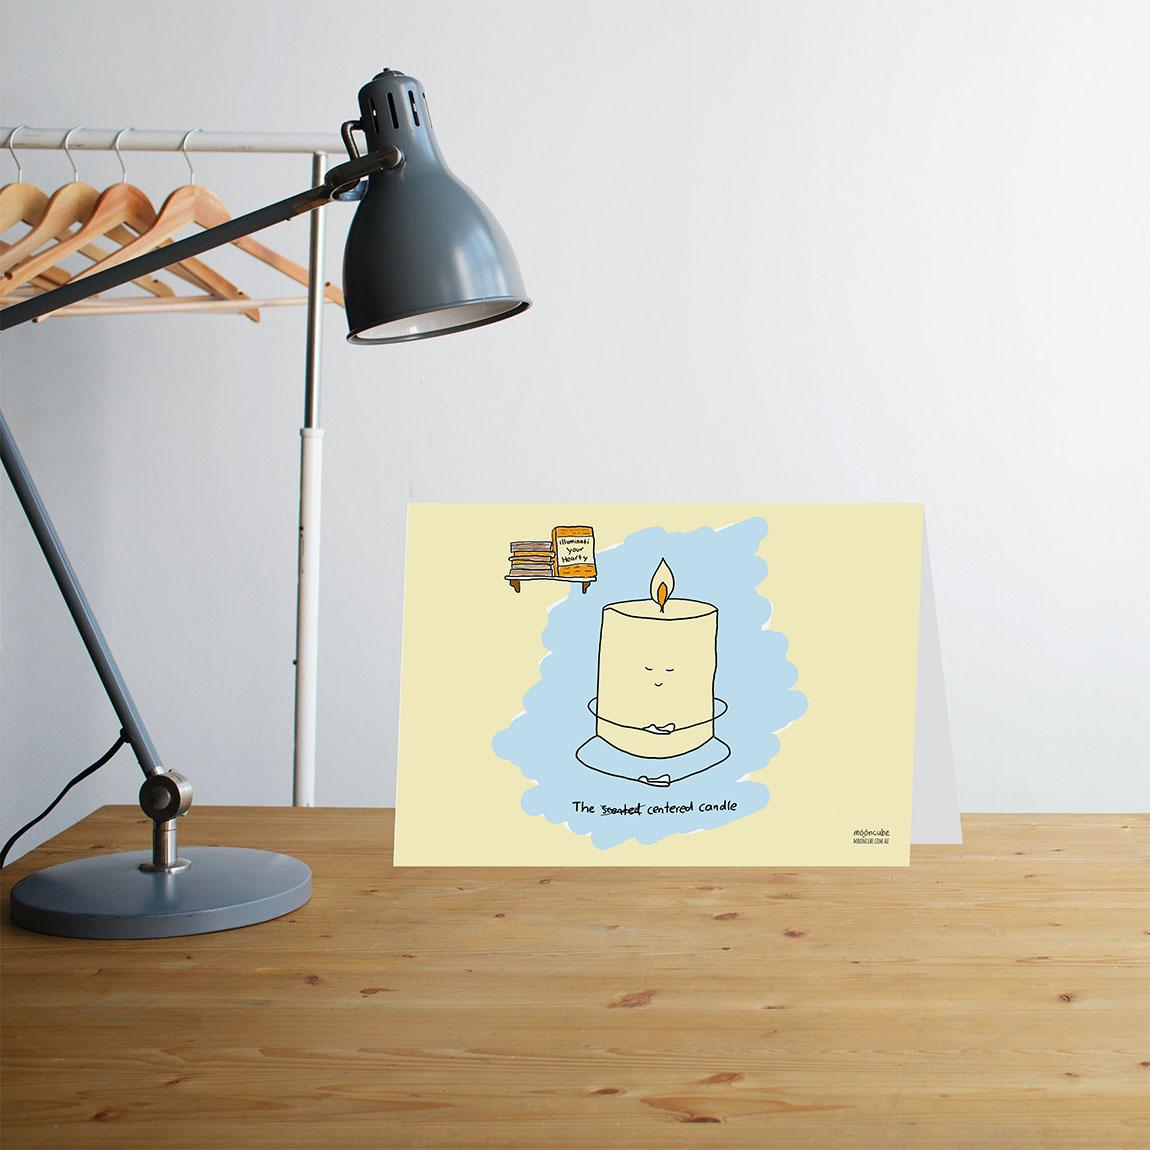 Moon Cube, Greeting Cards. Cartoons, comics, Australia.